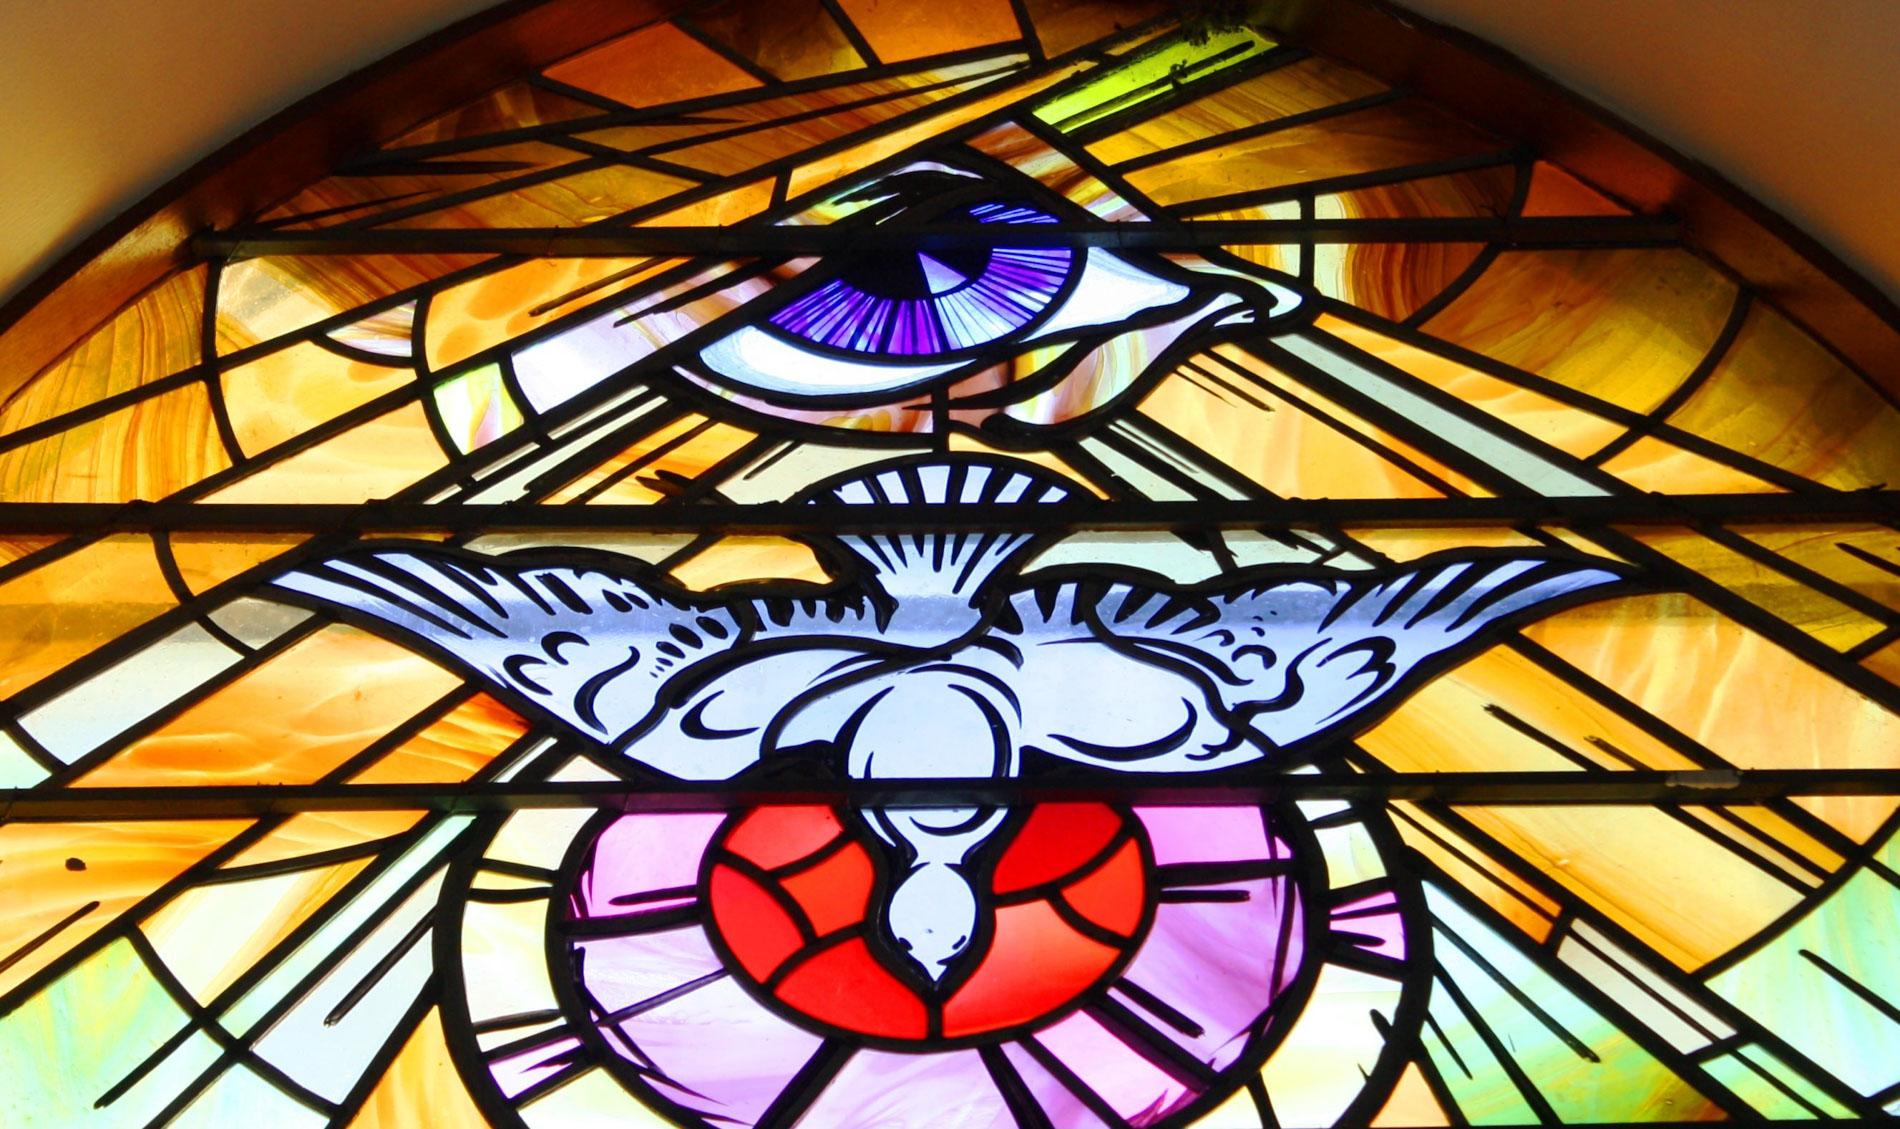 Ad Tuendam Fidem-Pope John Paul II on Protecting the Faith